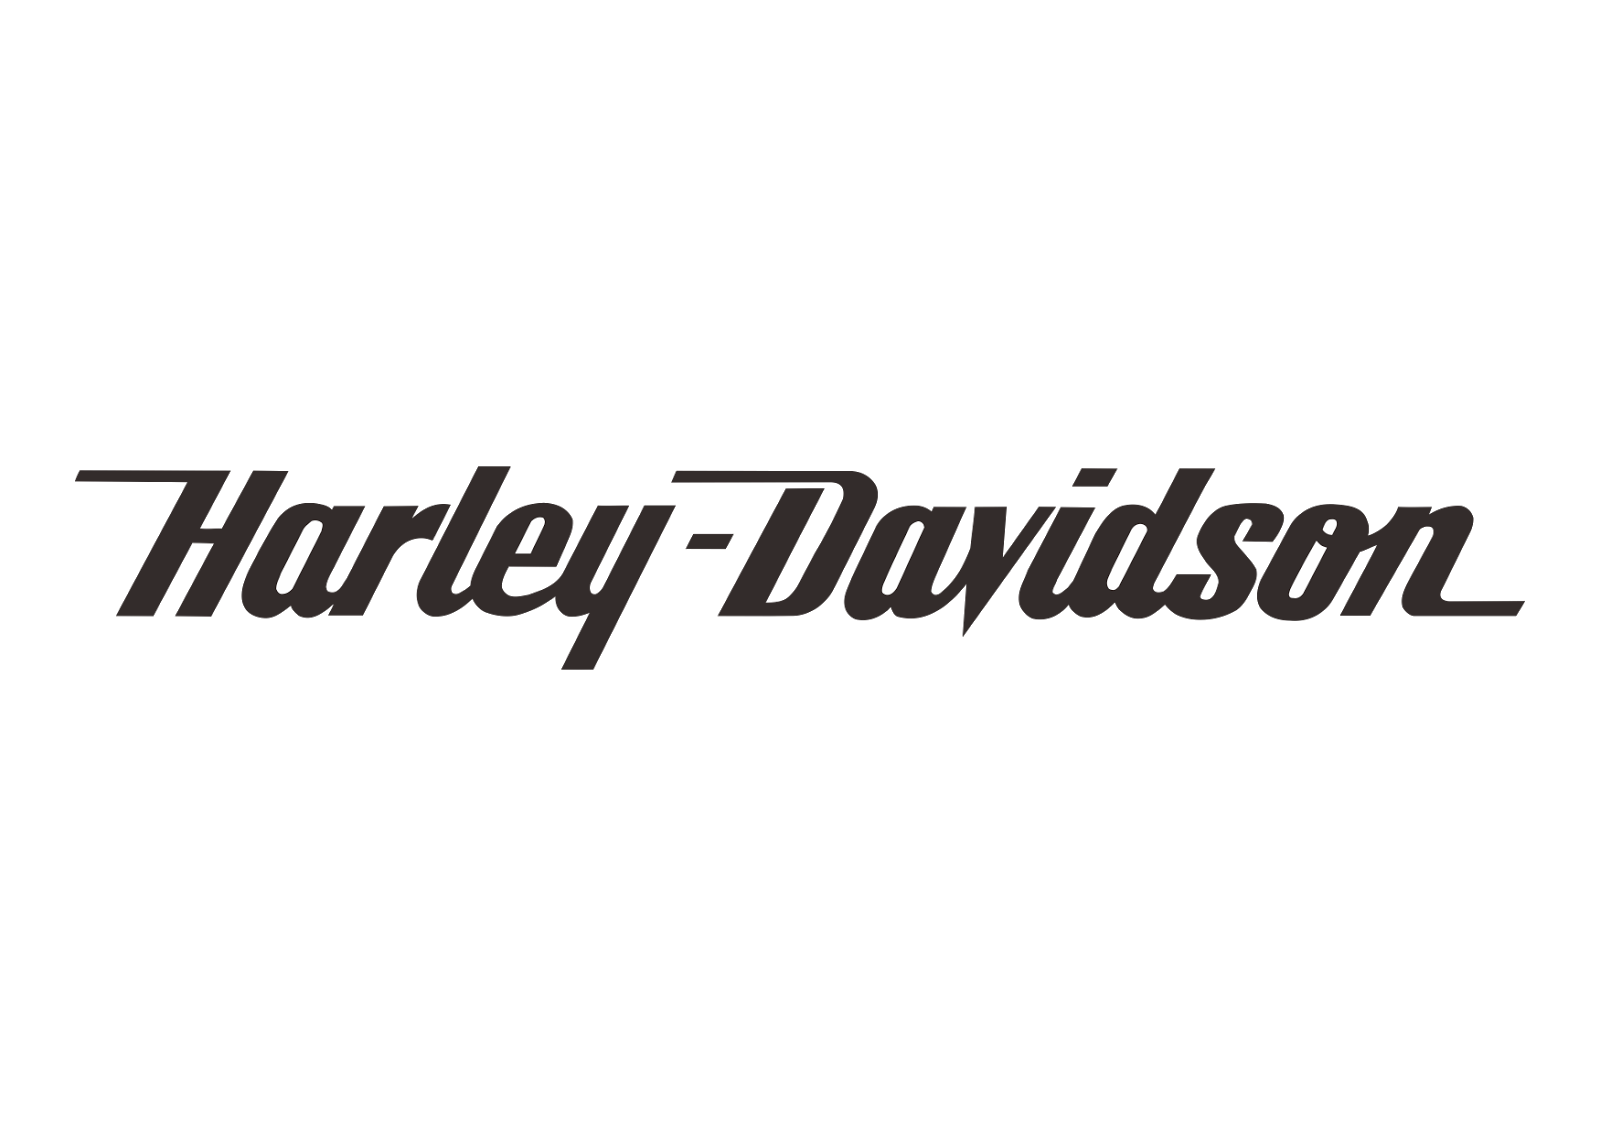 Harley Davidson Logo Black And White